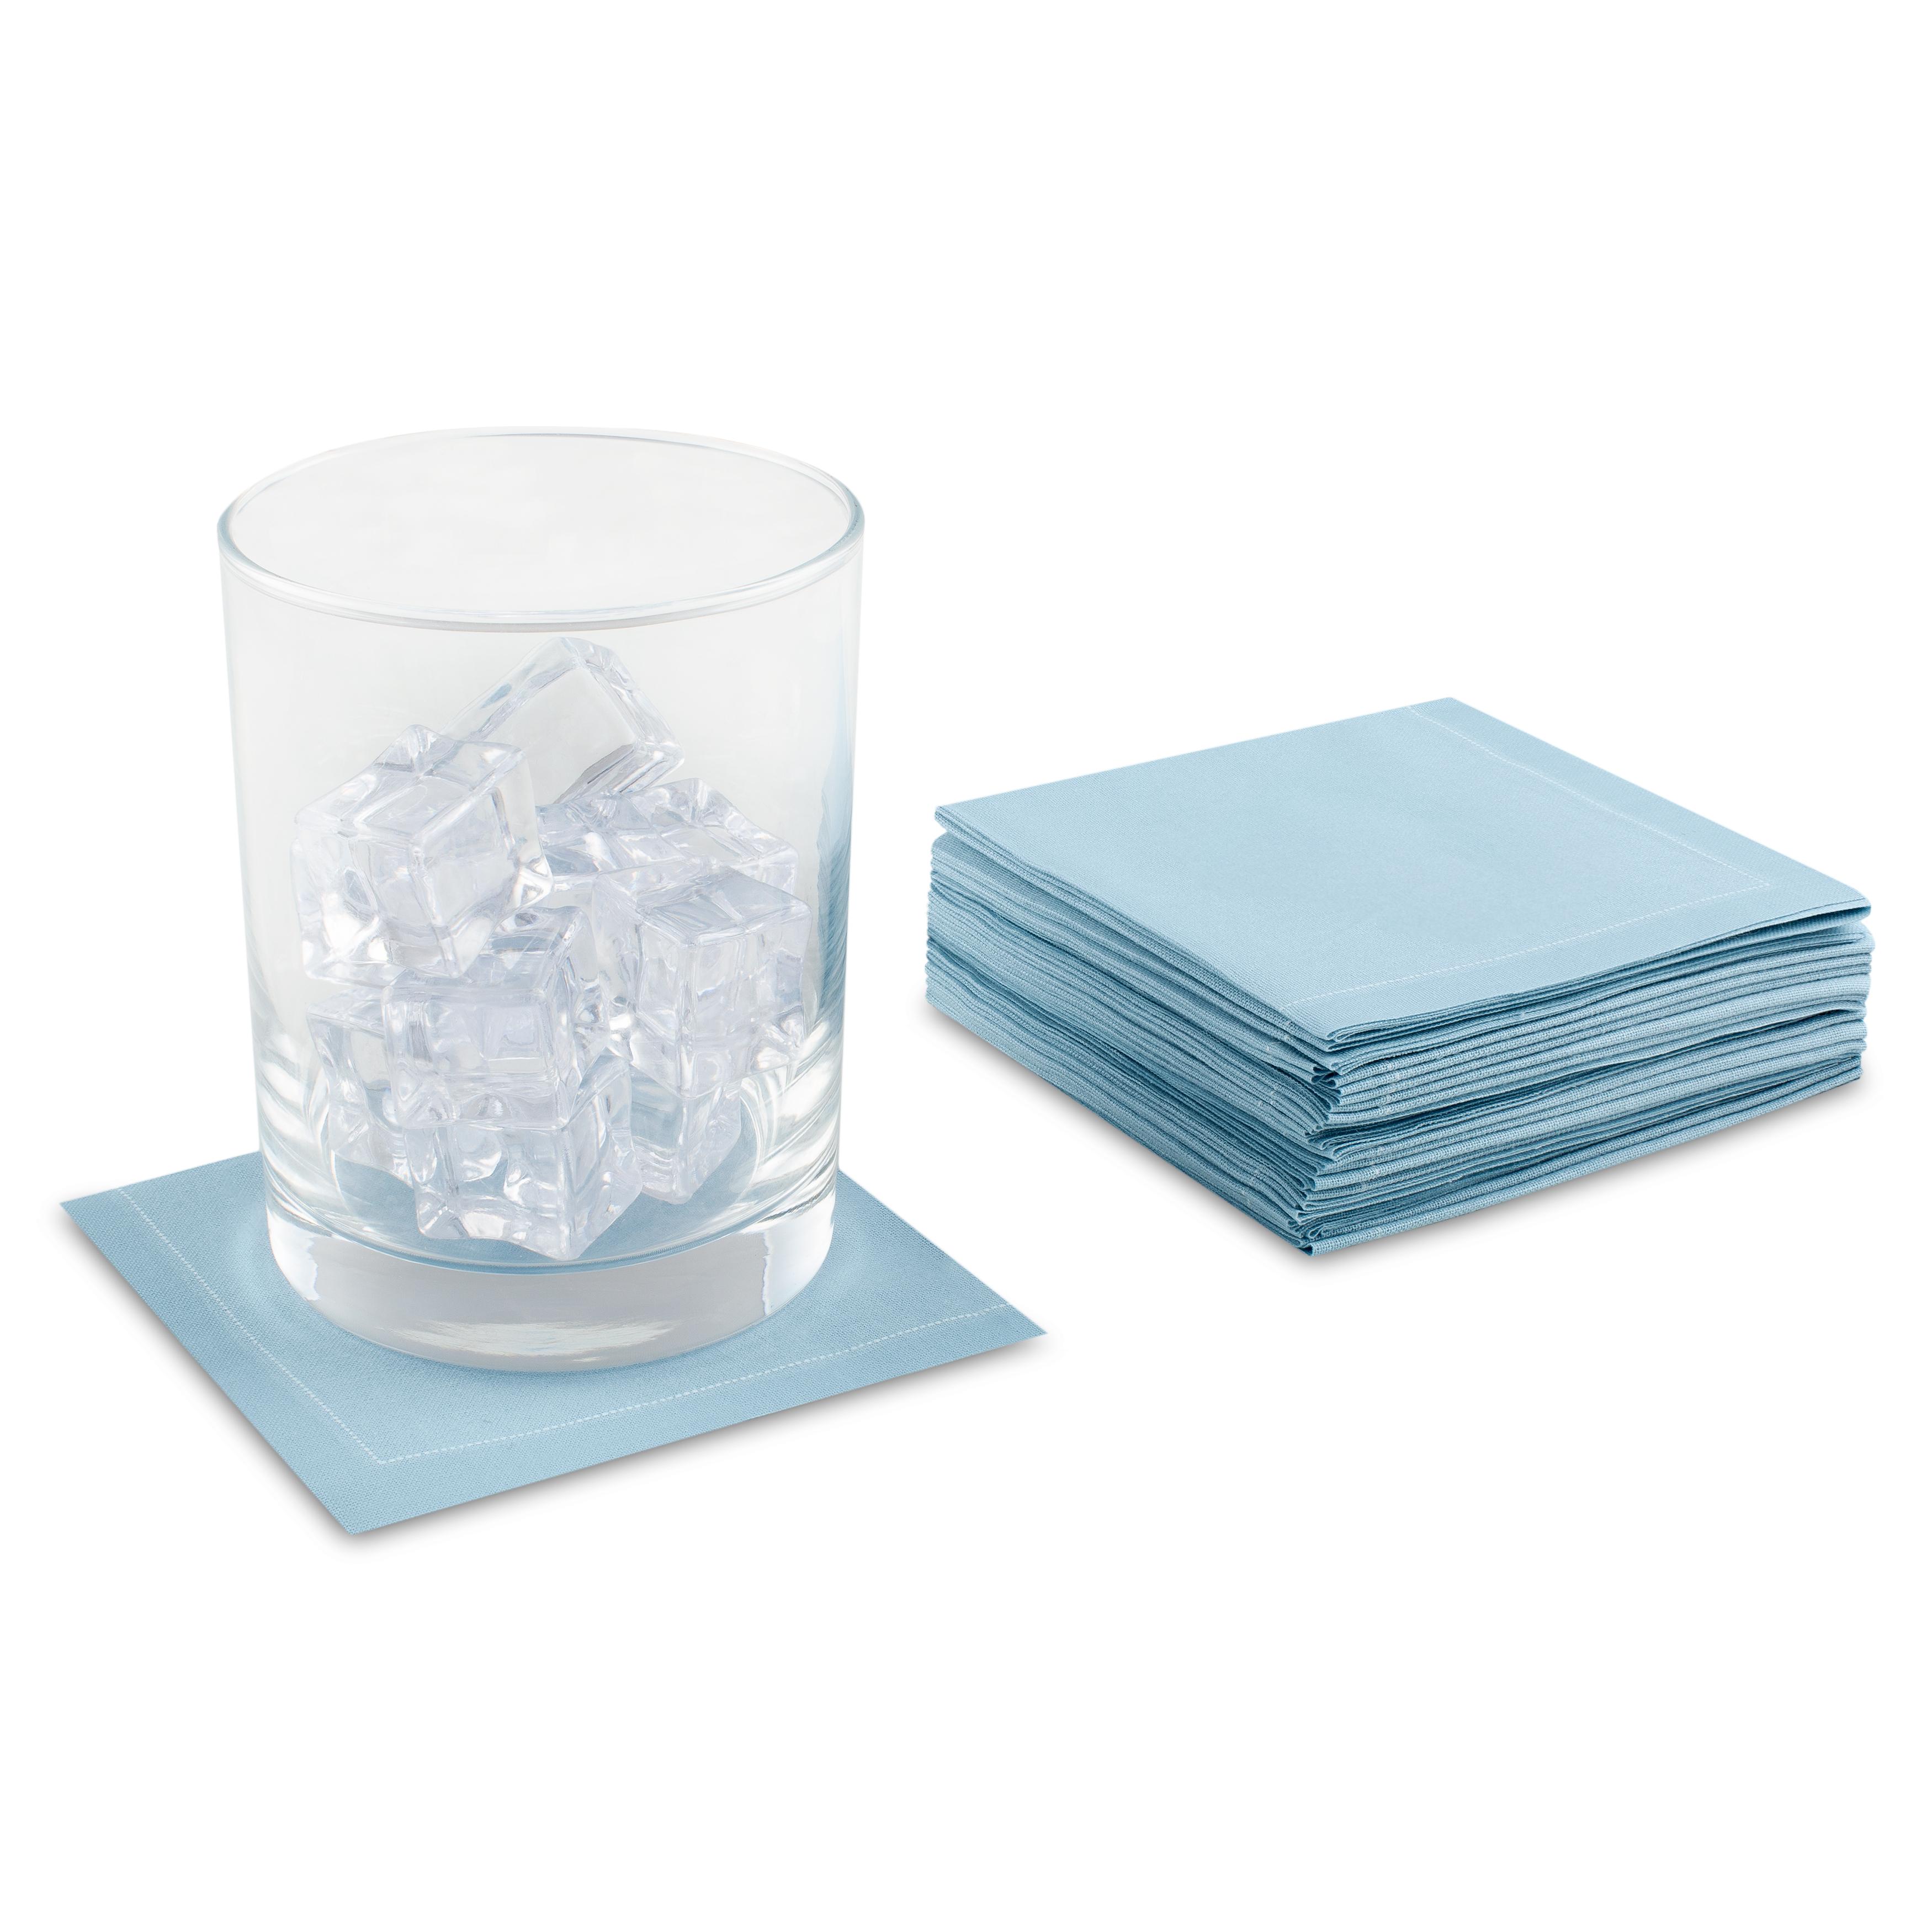 "Sky Blue Cotton 1/4 Fold Cocktail (140 GSM) - 8"" x 8"" (folded 4"" x 4"") - 600 units"